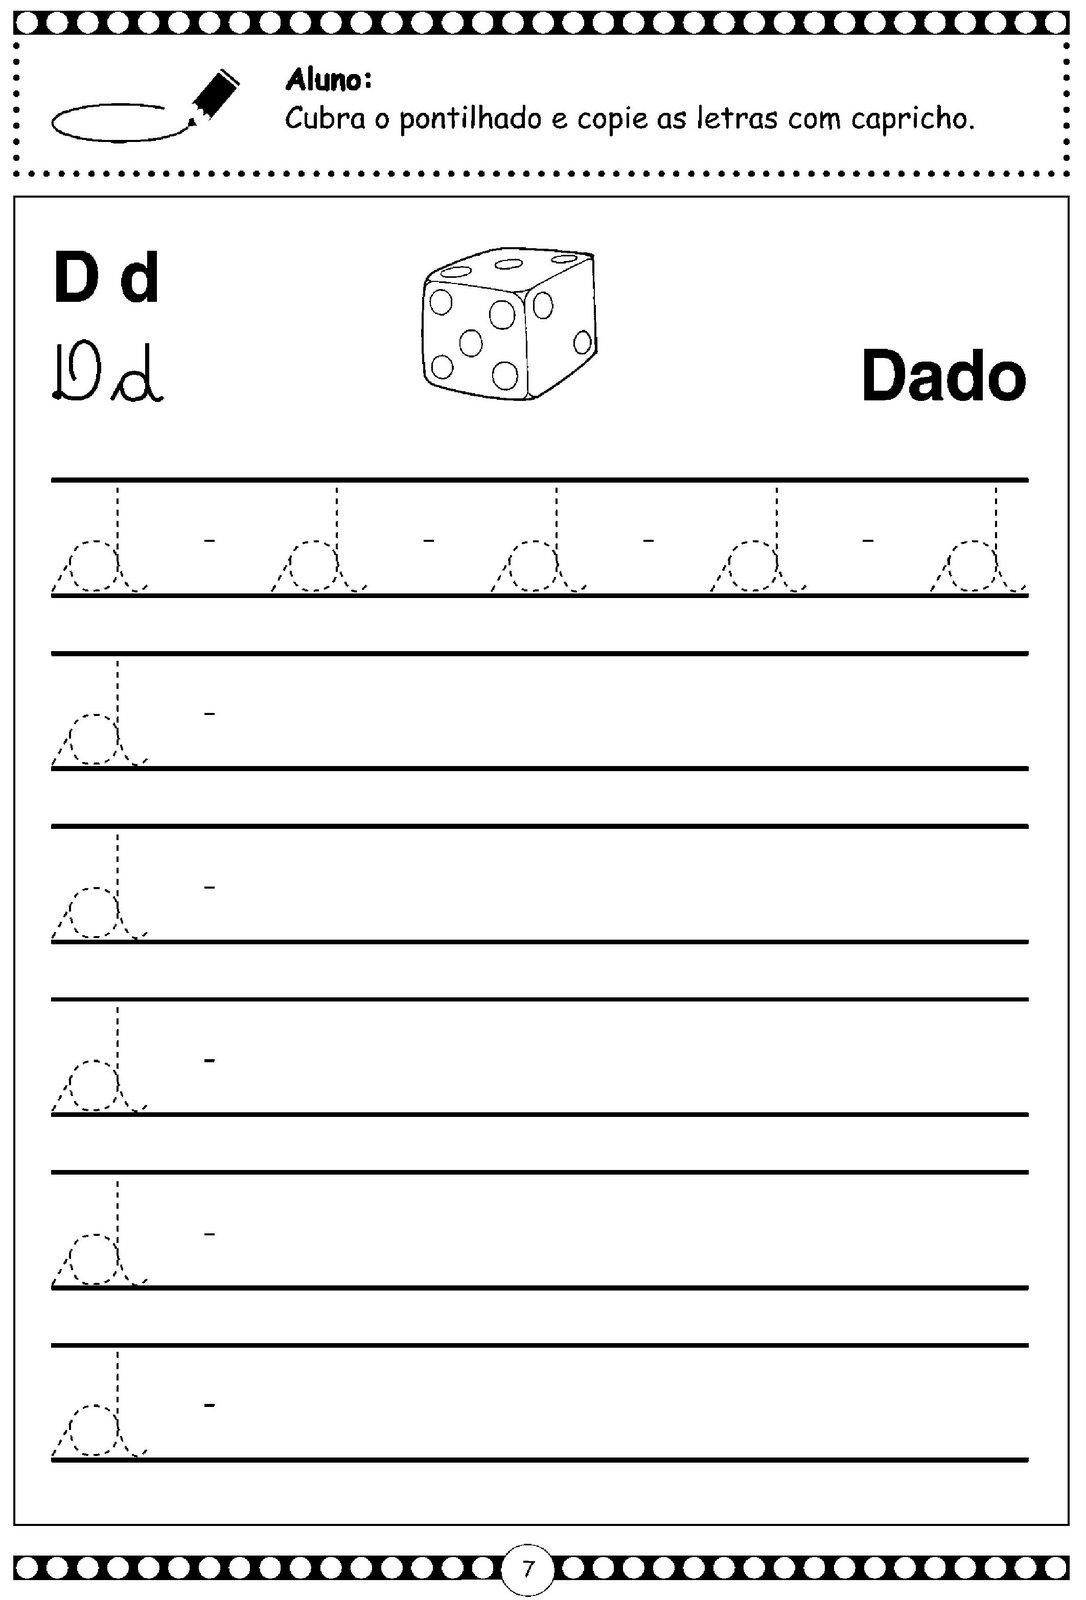 Alfabeto Cursivo Letra D – Minuscula